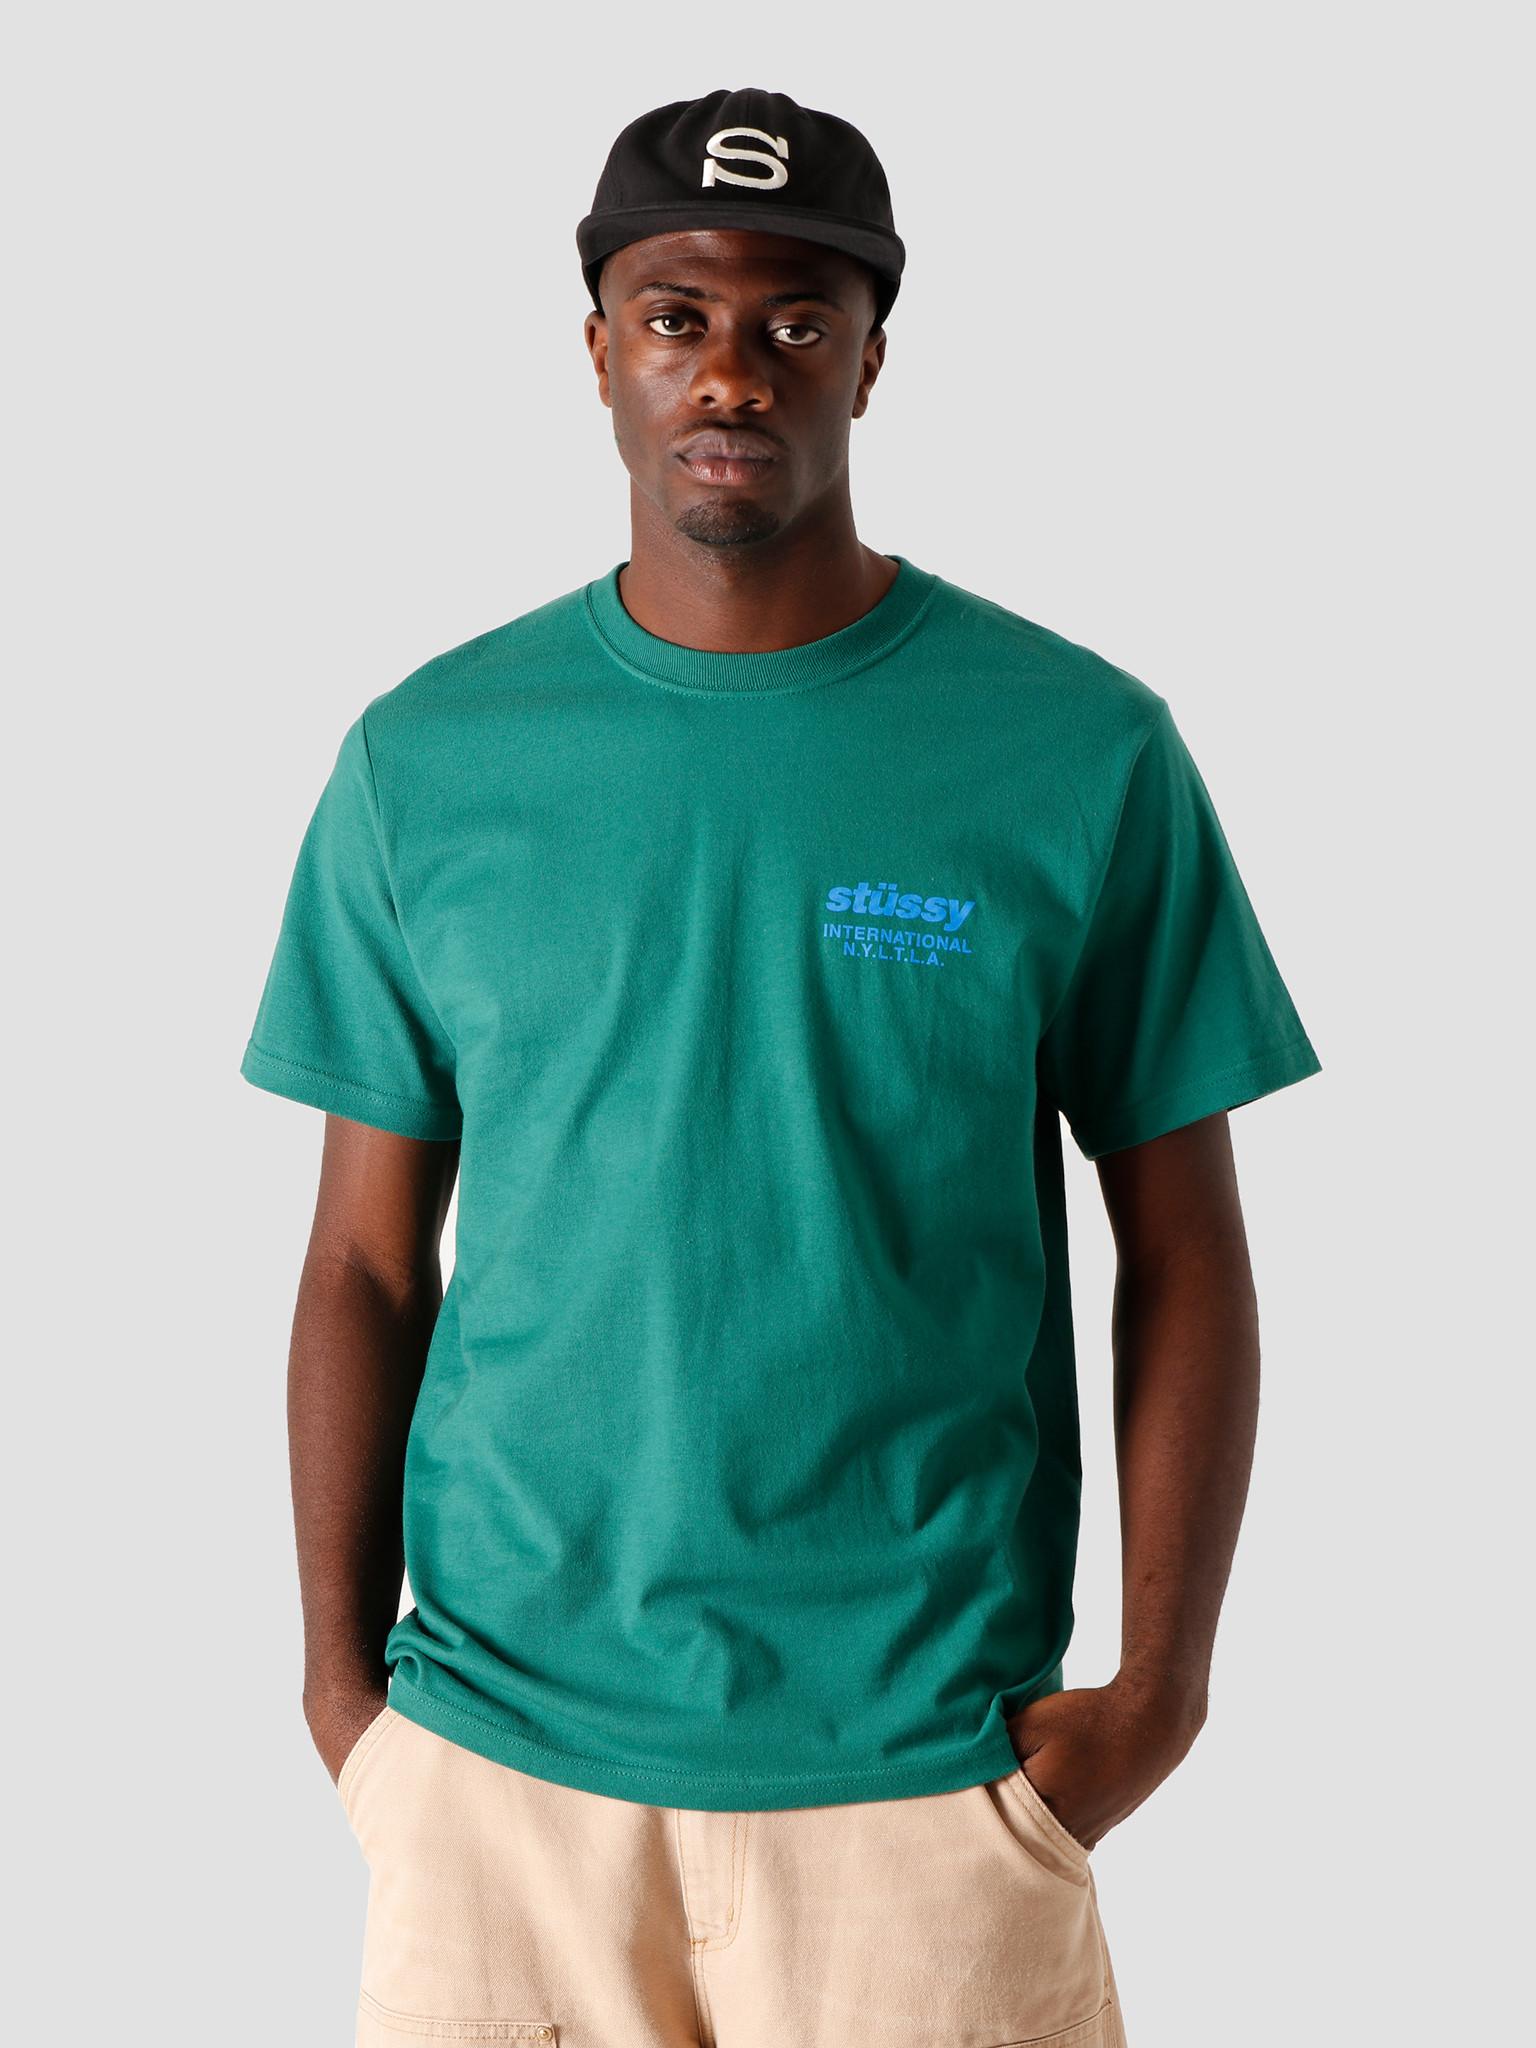 Stussy Stussy Windflower T-Shirt Dark Green 1904589-0450